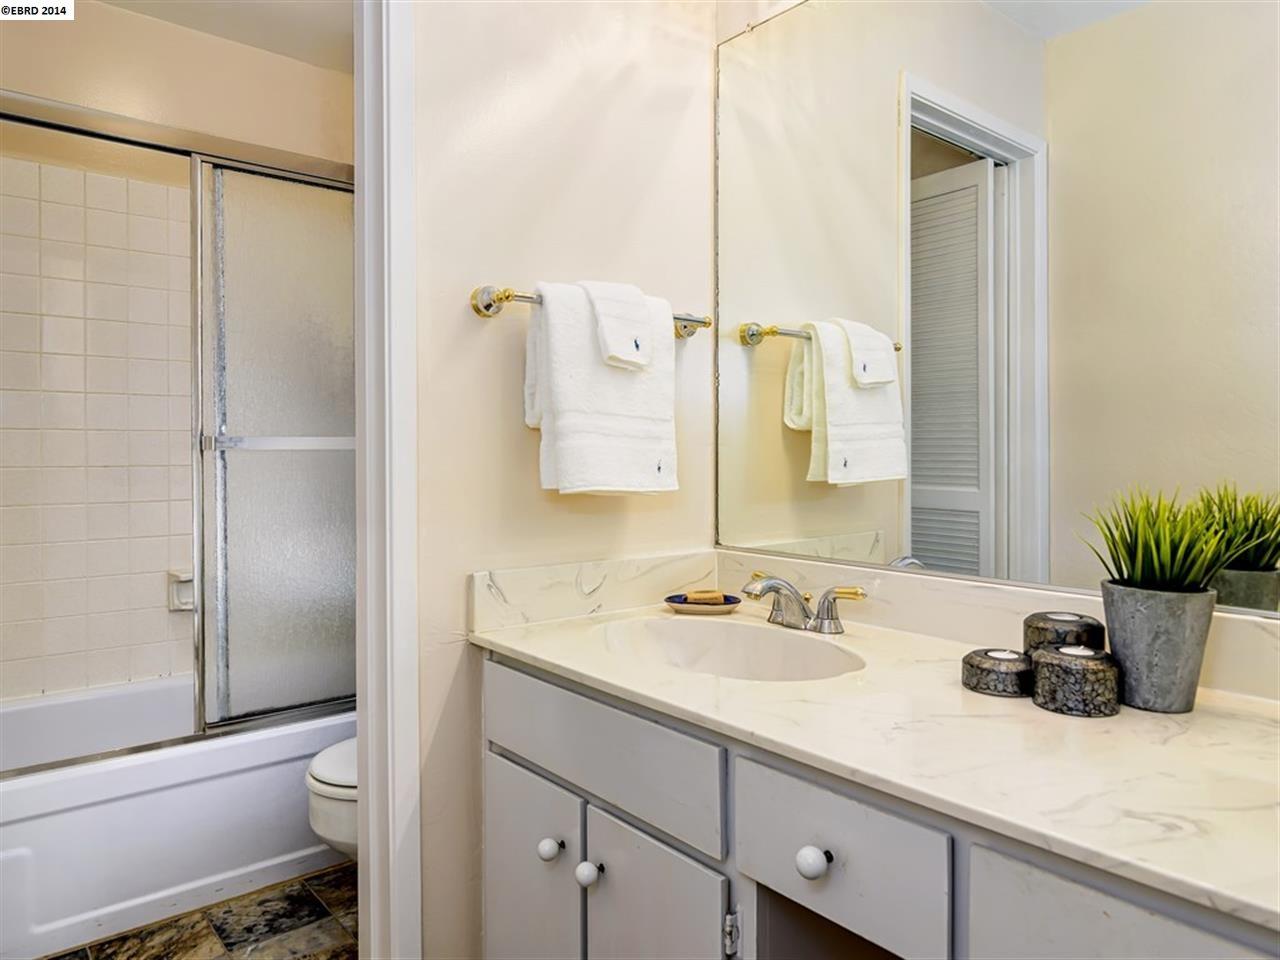 Additional photo for property listing at 250 Whitmore Street  Oakland, California 94611 Estados Unidos